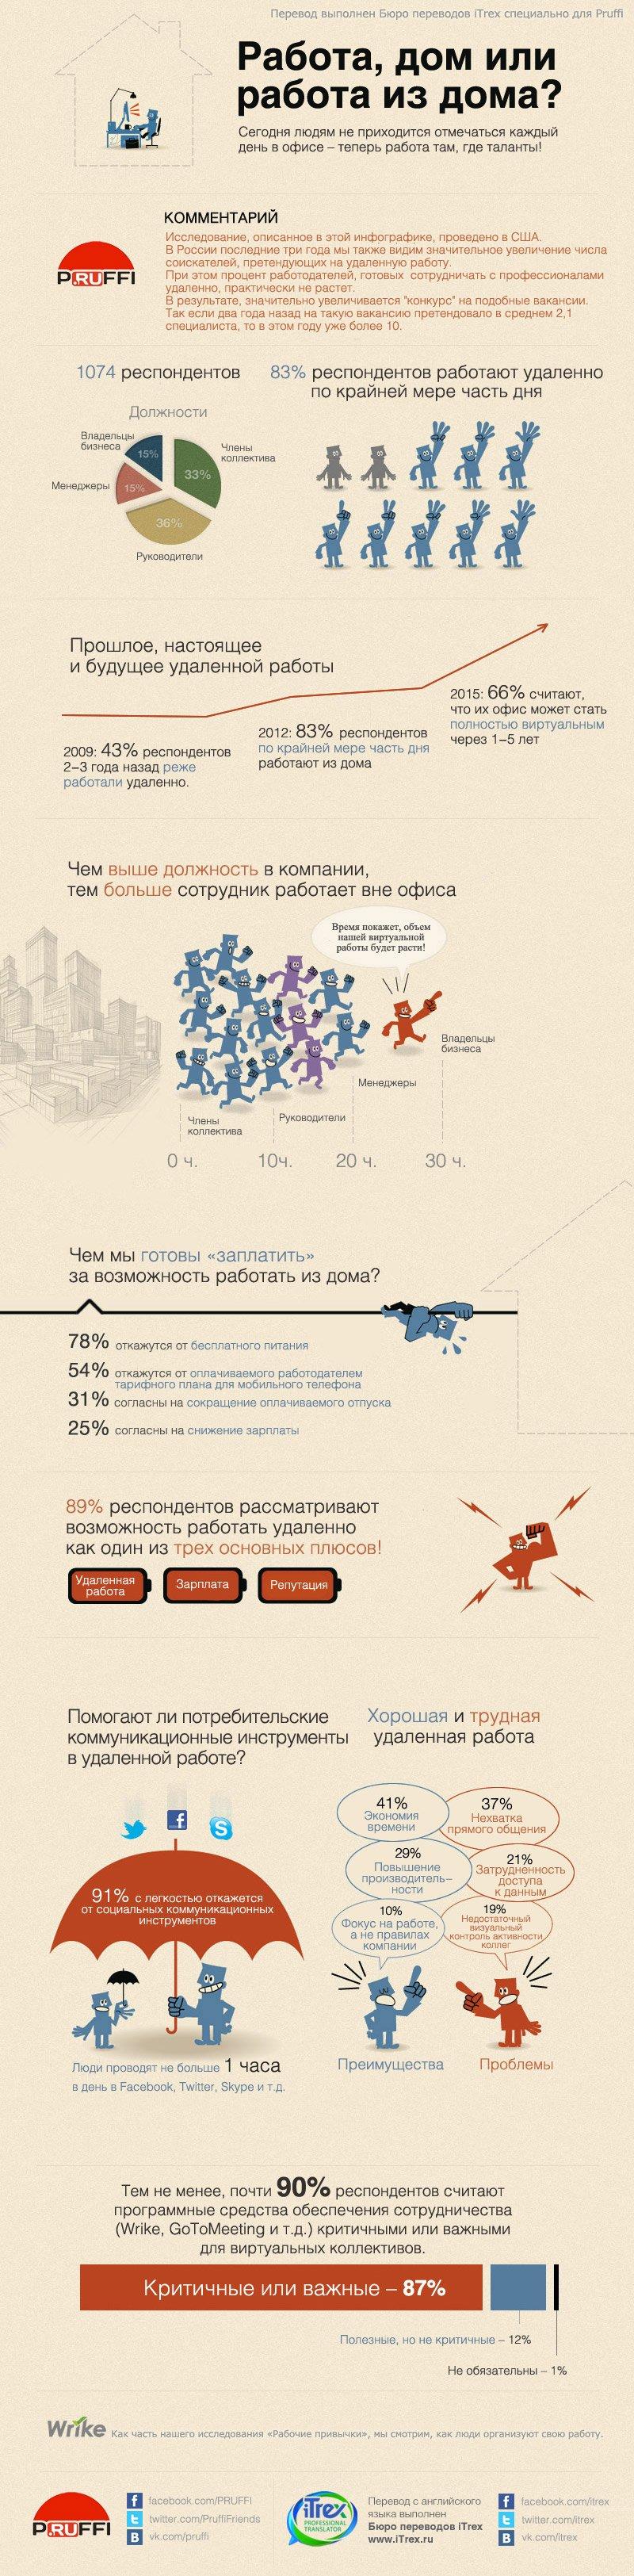 perevod infografiki udalennaay rabota ili office 2 1